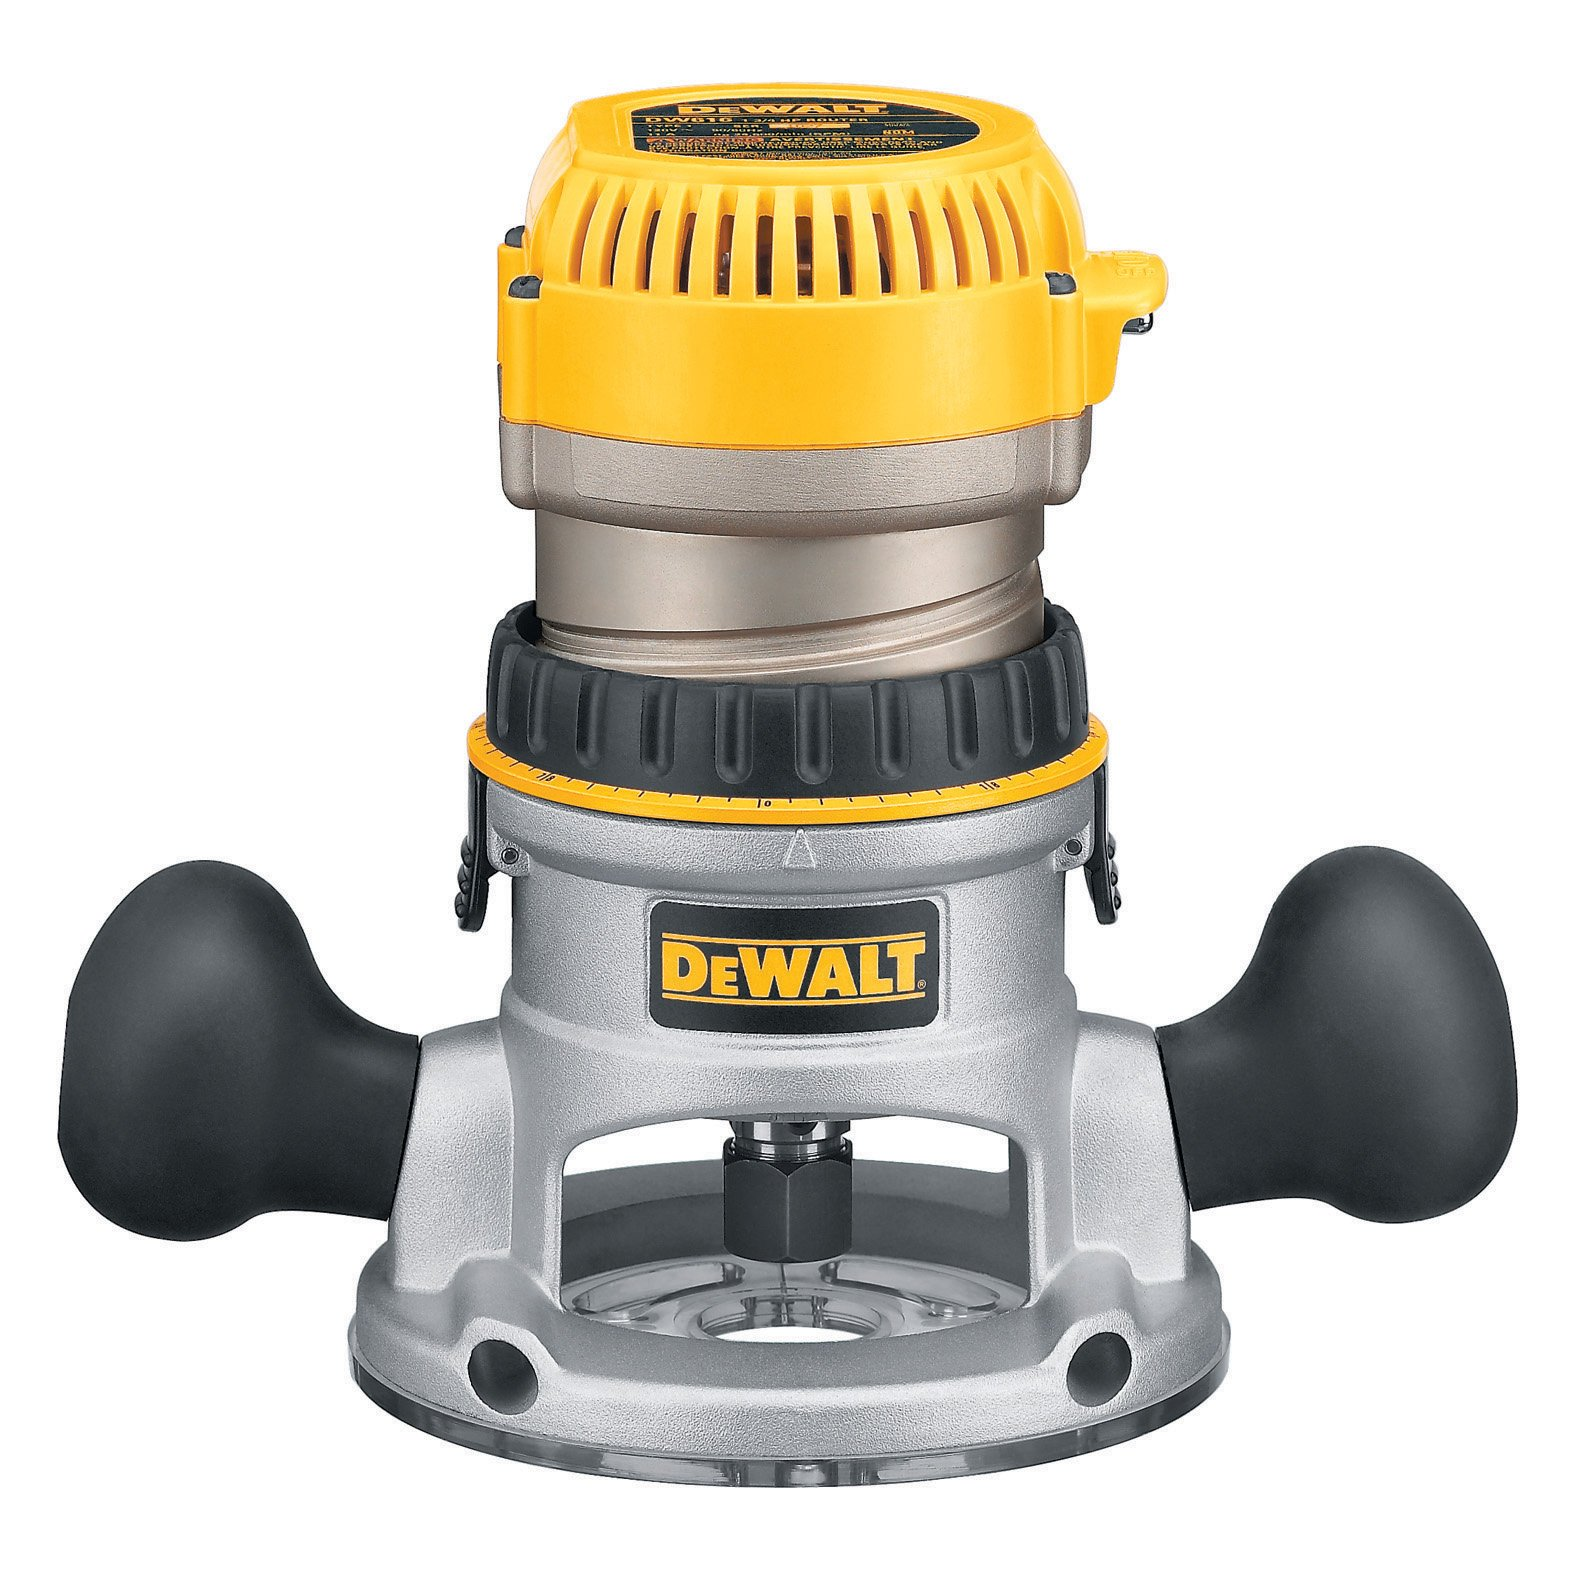 DEWALT DW616 1-3/4-Horsepower Fixed Base Router